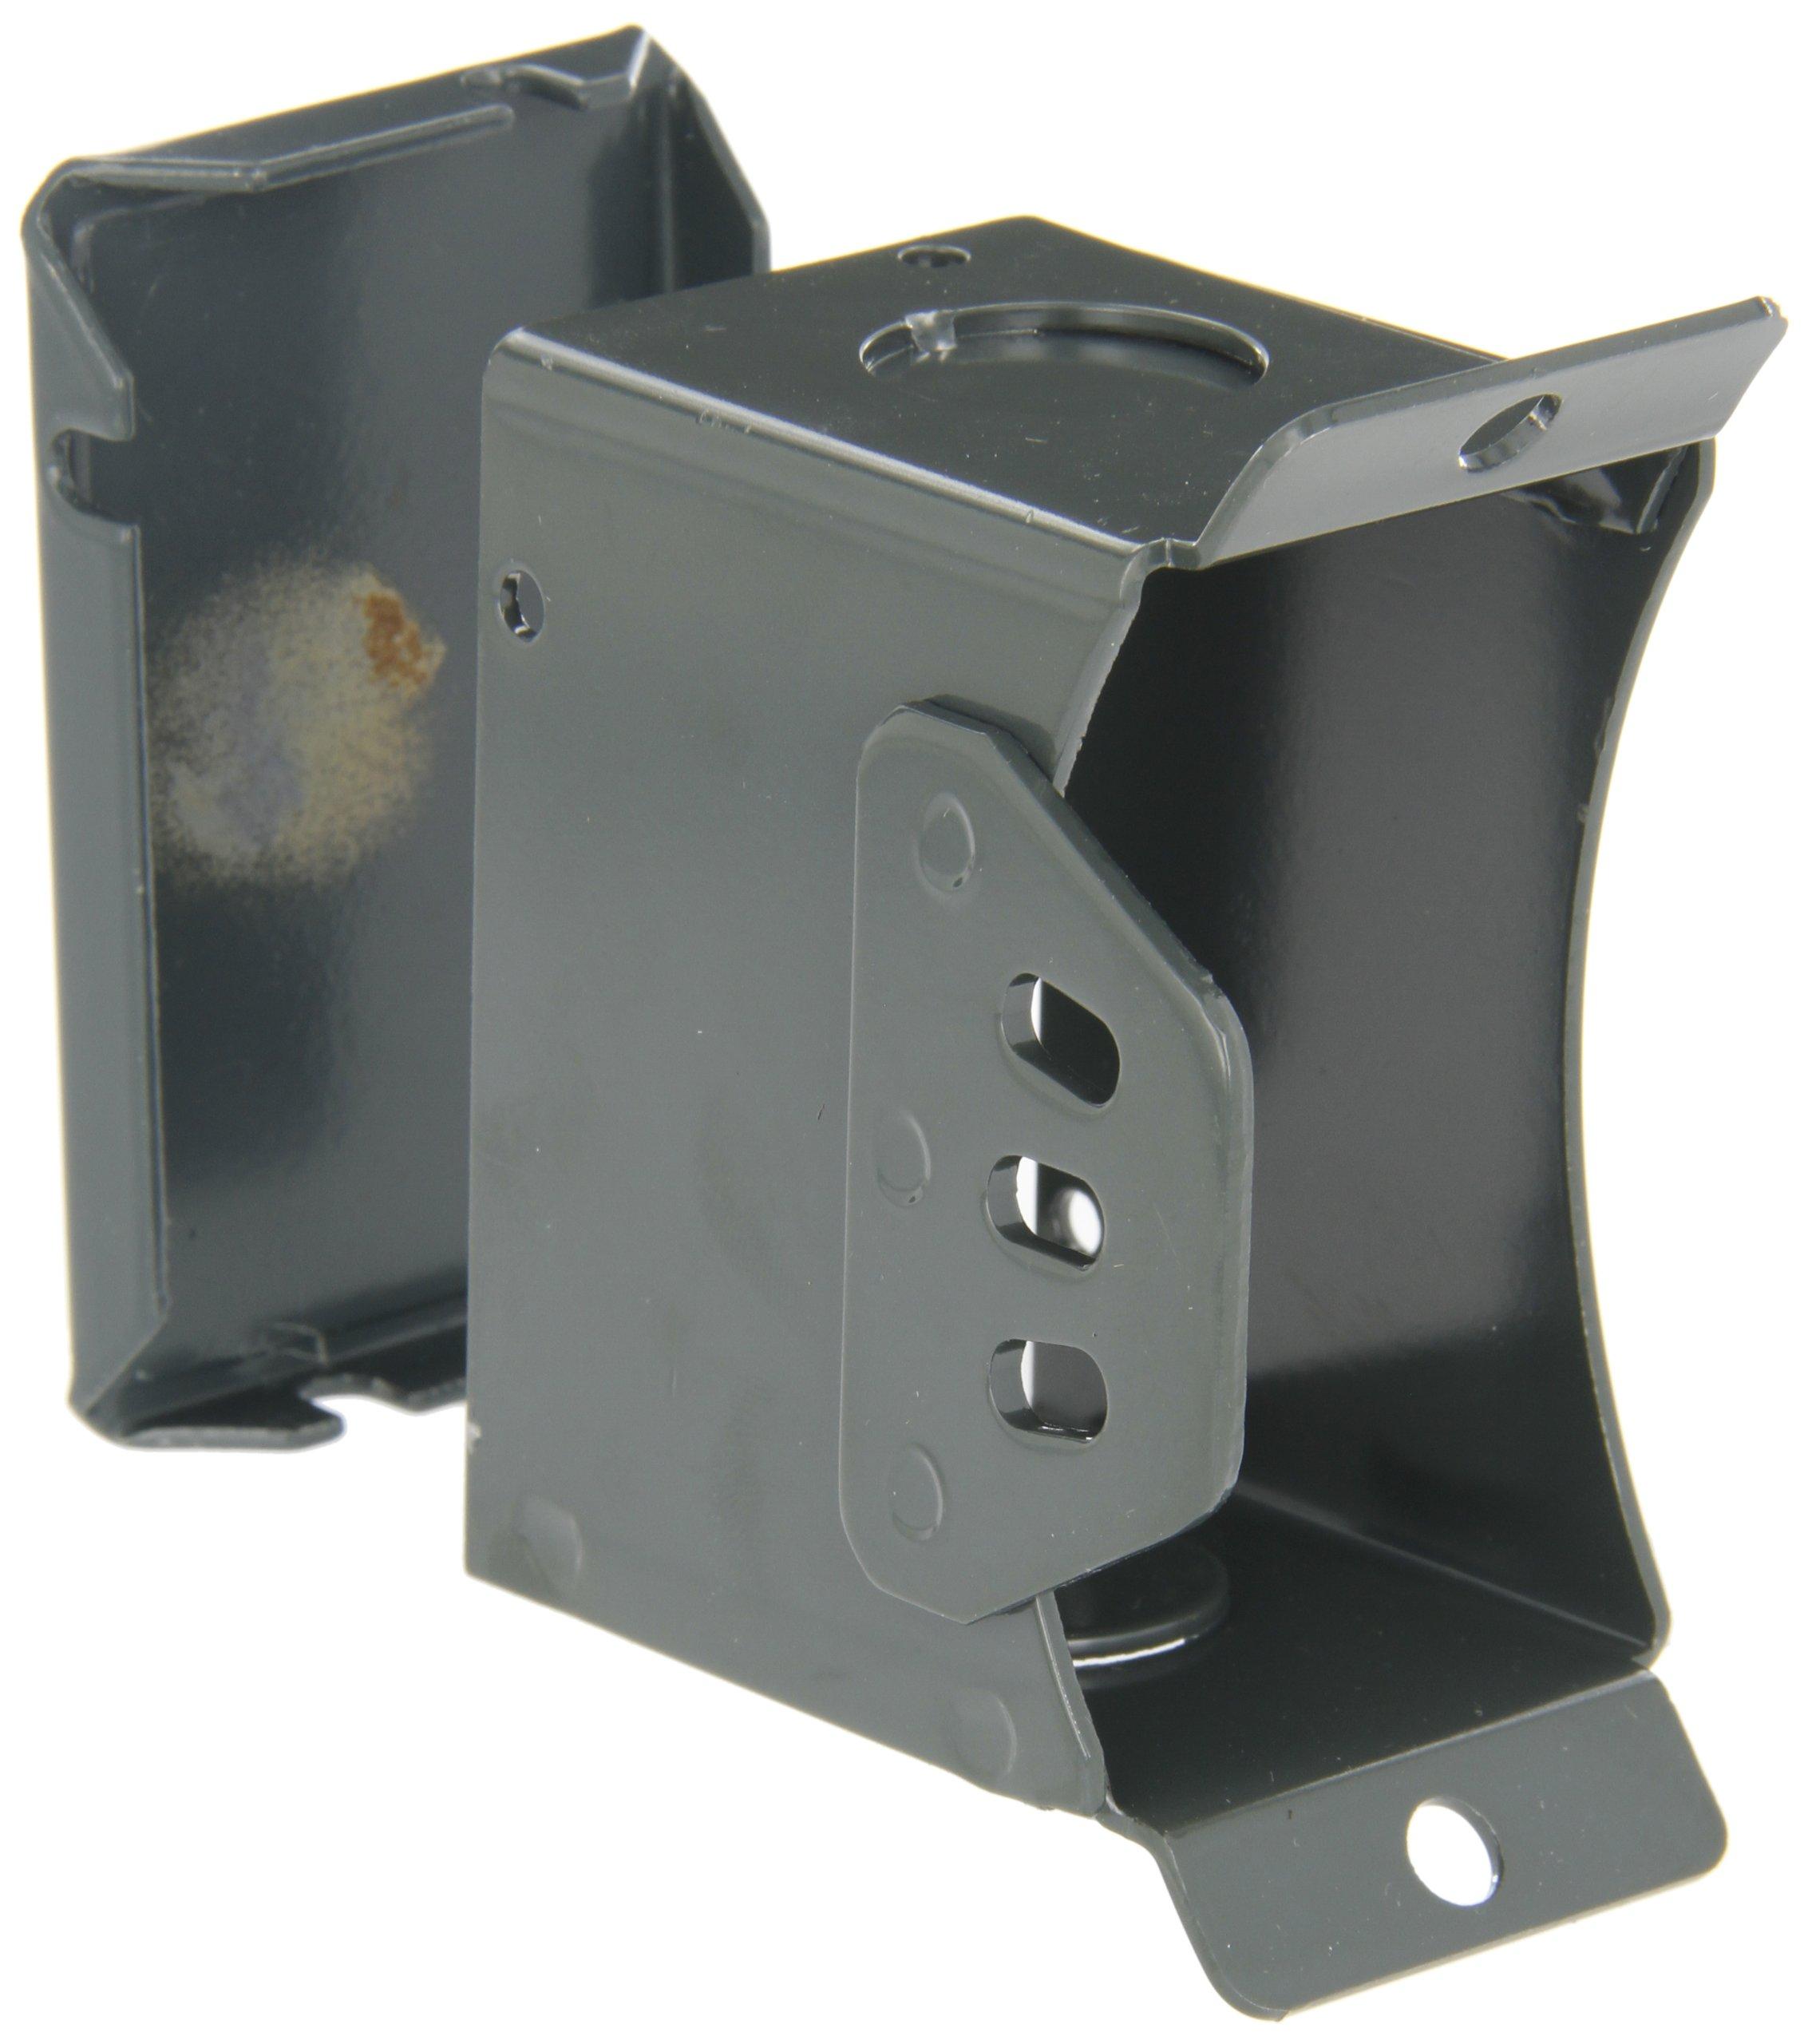 Fasco KIT144 Gray Tie-Rod Mountable Conduit Box, For 4.4'', 5'' and 5.6'' Diameter Motors